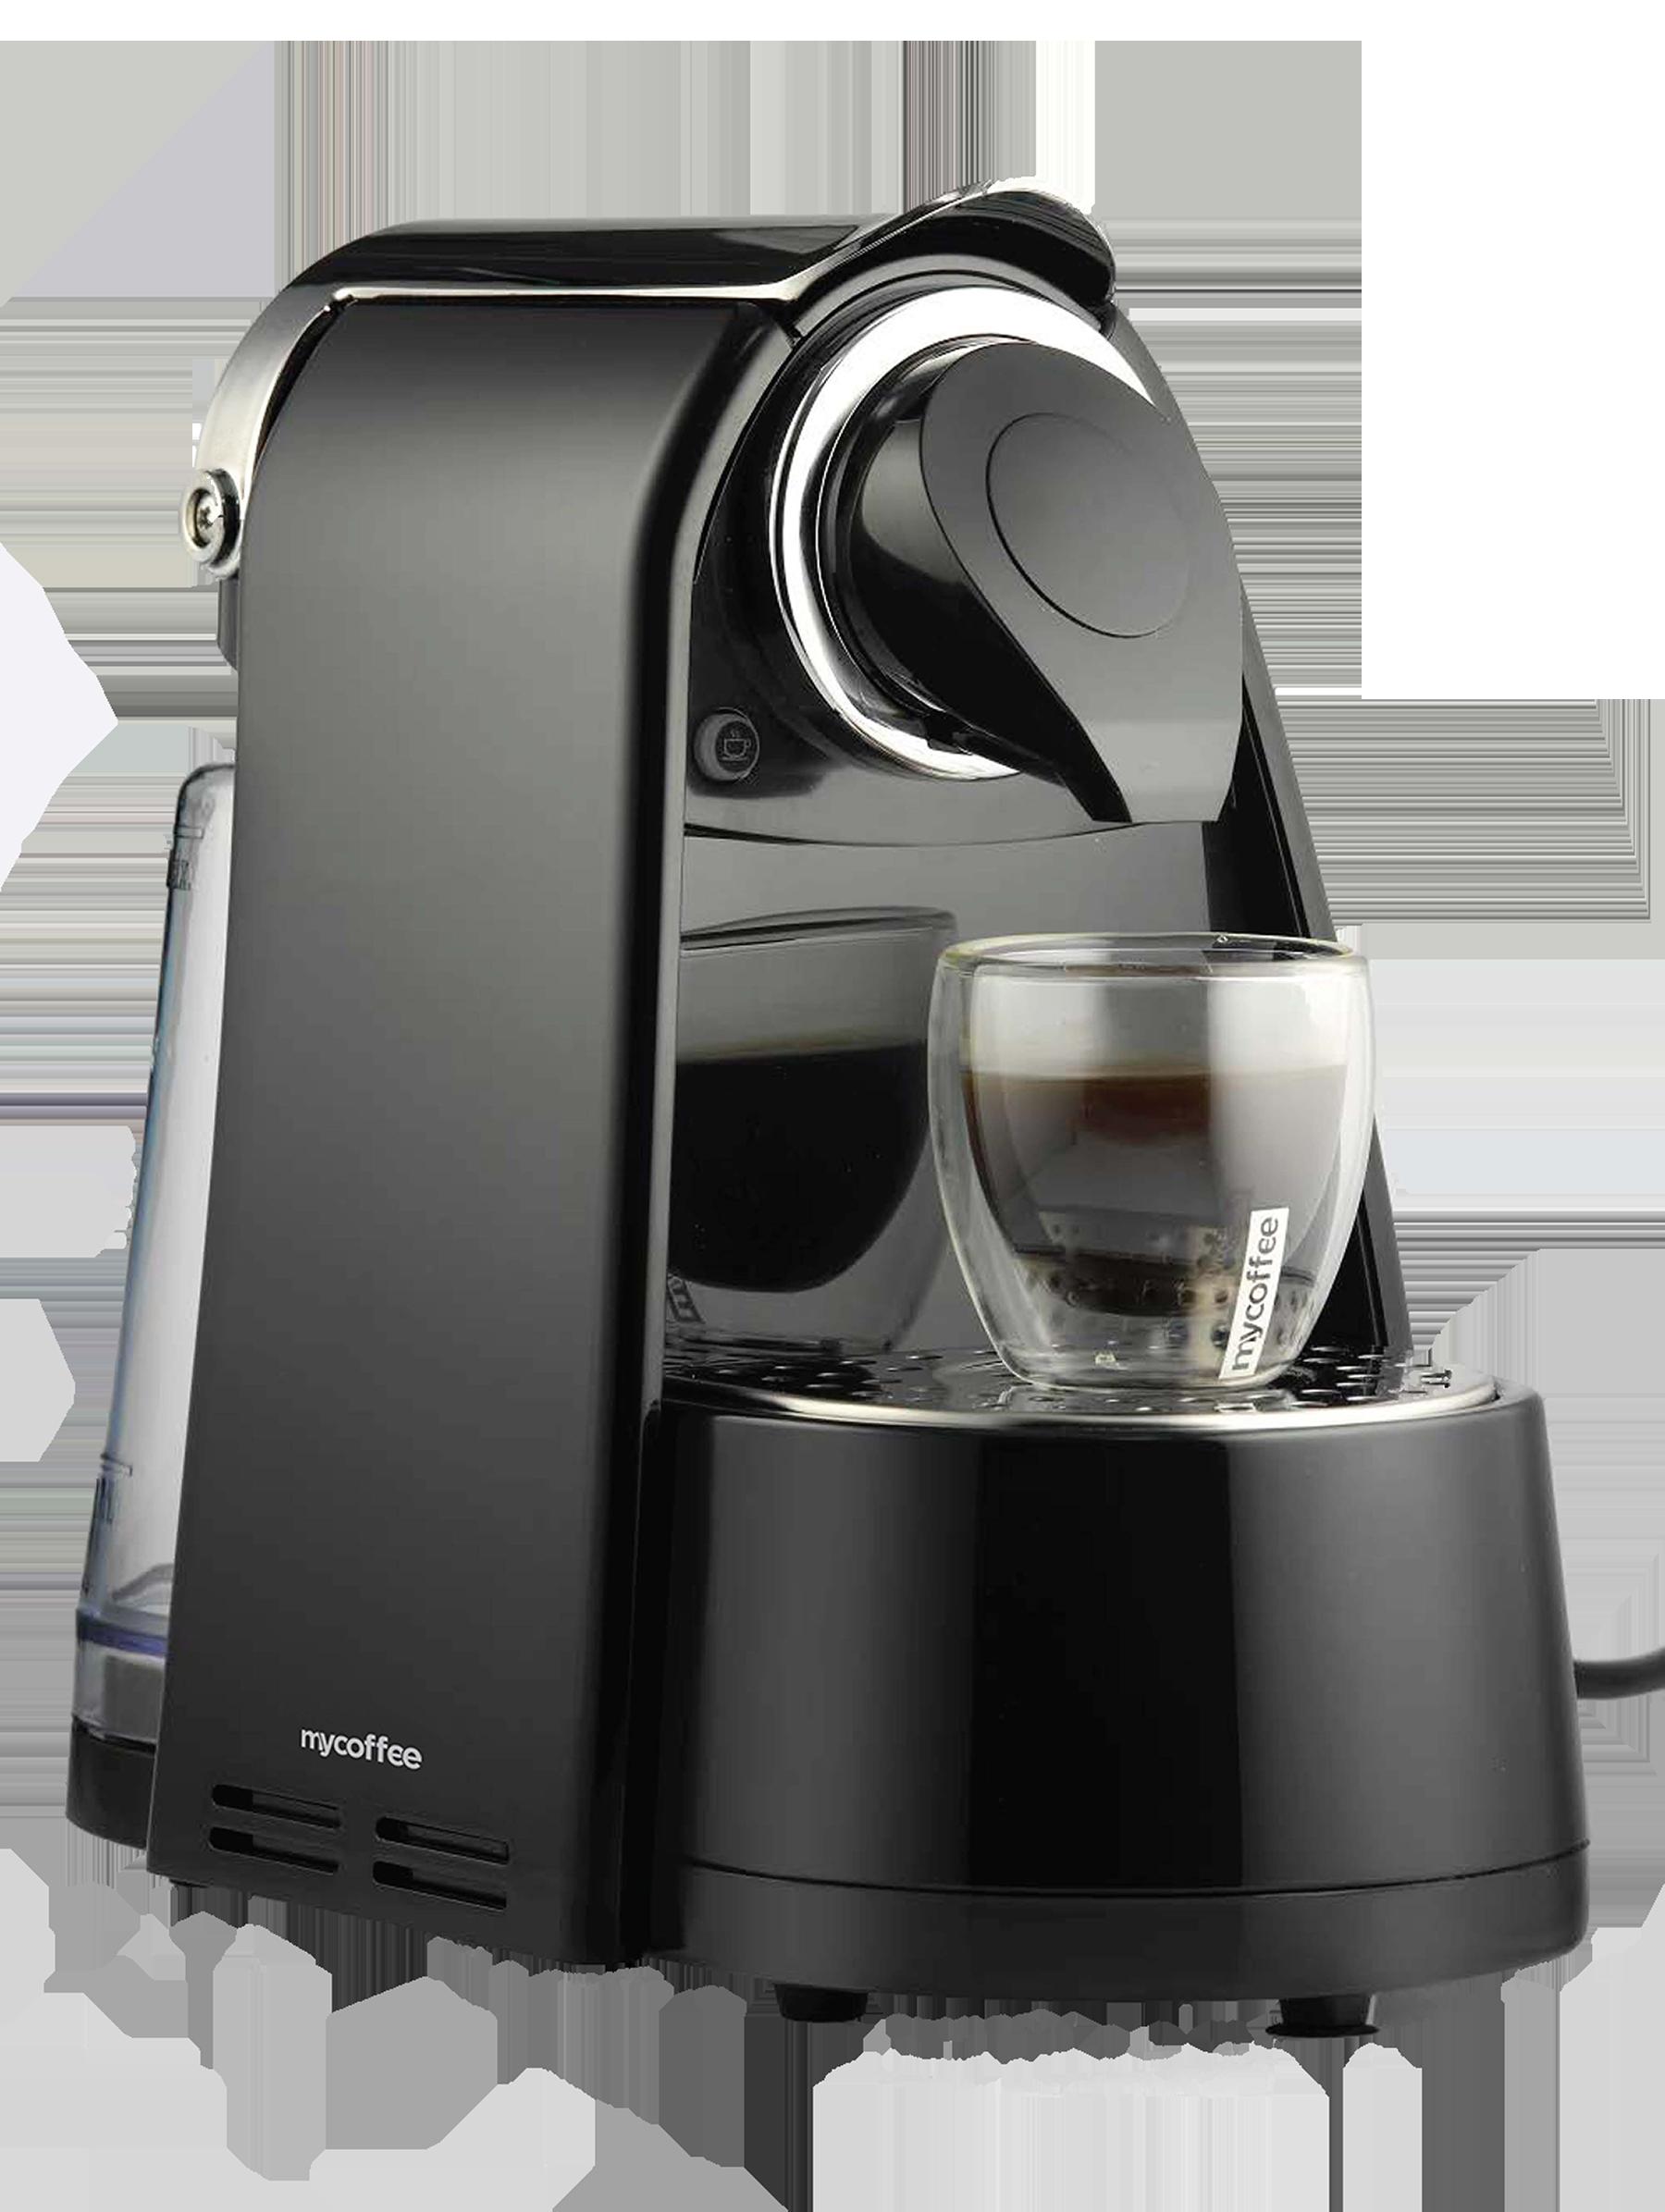 allmycoffee Nespresso® compatible programmable coffee